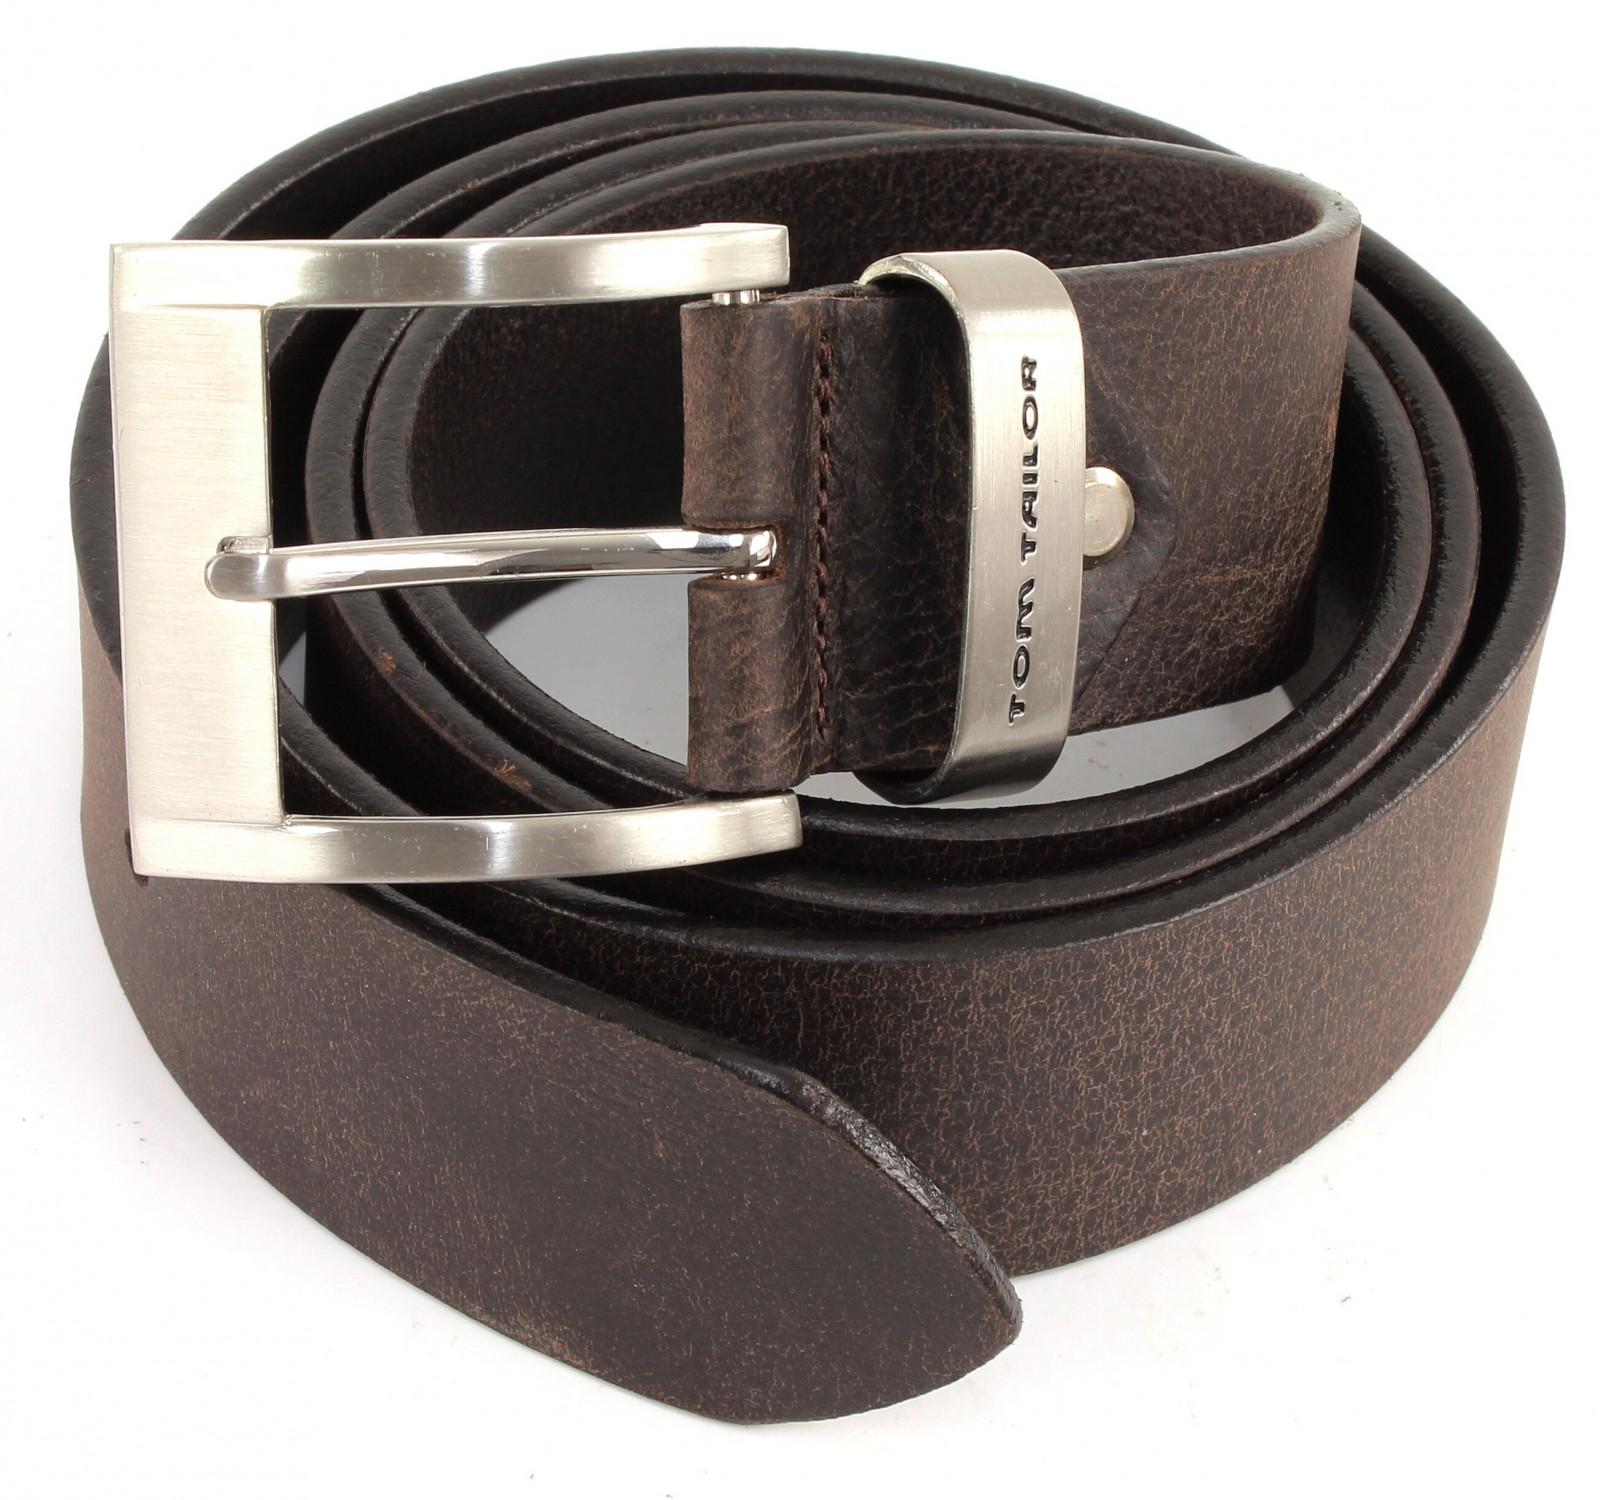 TOM TAILOR Belt TG1165H31 W80 Dark Brown